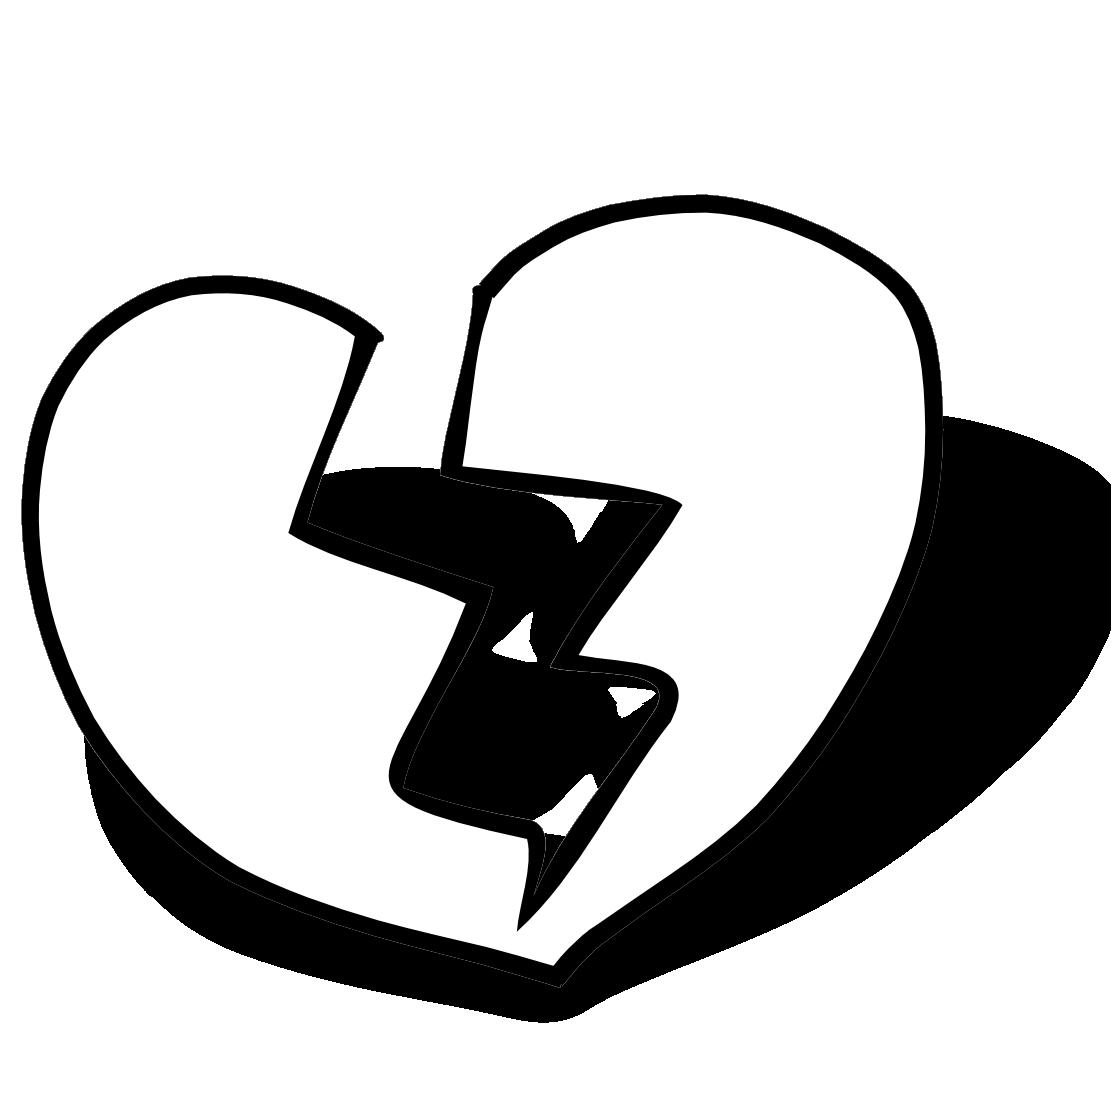 Hearts clipart man. Broken heart black and